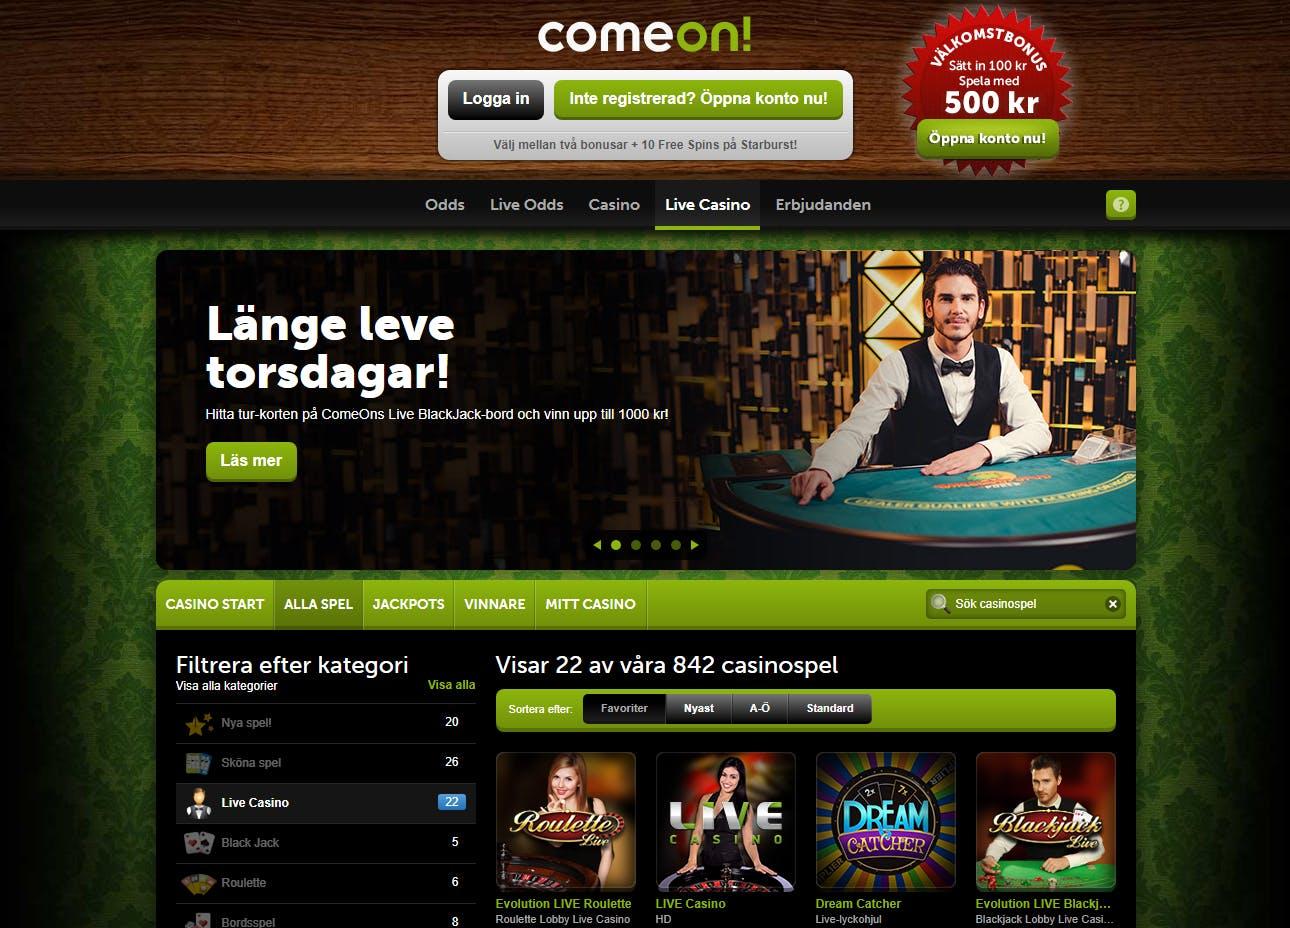 Comeon gäst casinospel Leichtdominanten